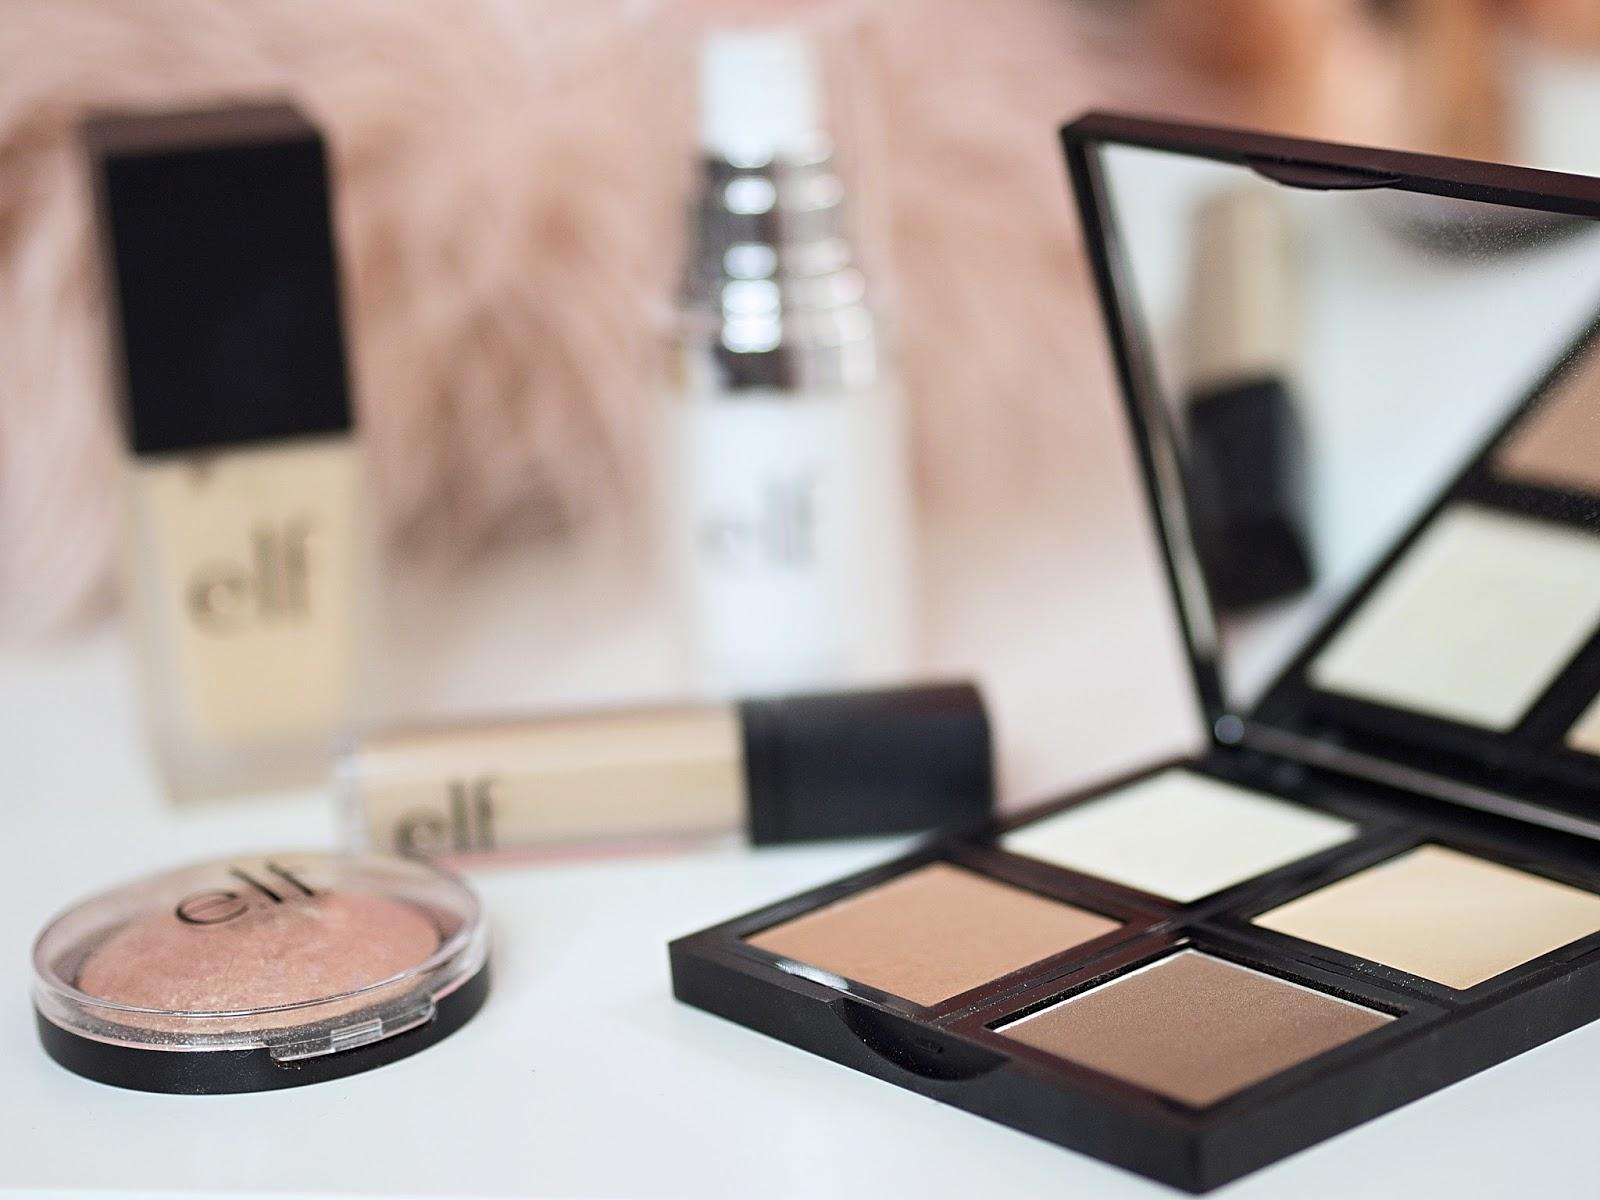 The Best of ELF Cosmetics